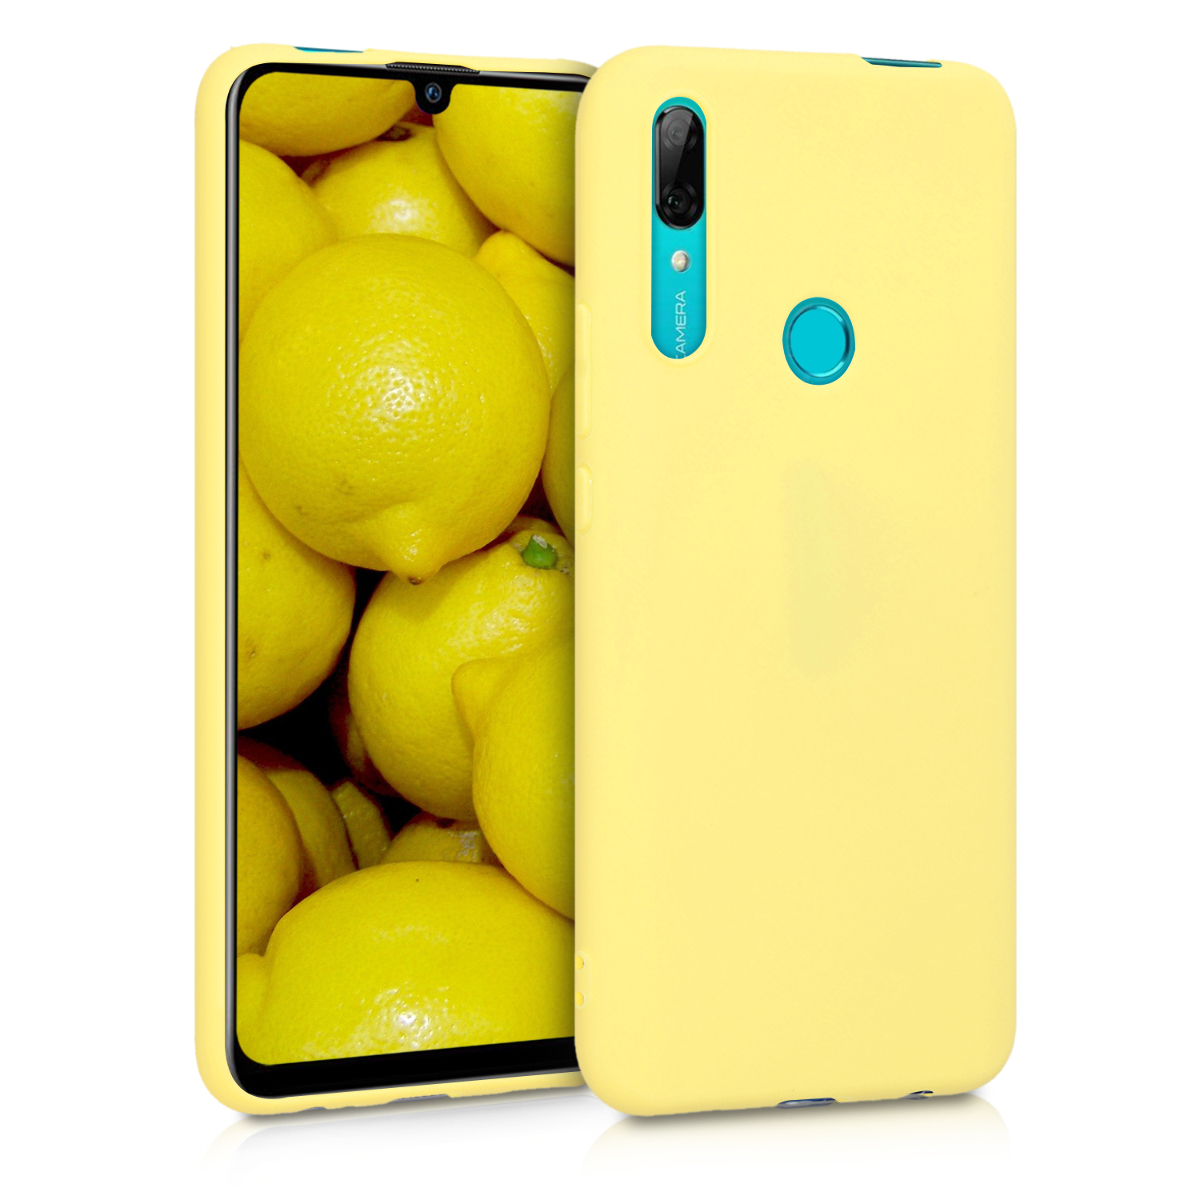 KW Θήκη Σιλικόνης Huawei P Smart Z - Yellow Matte (49449.49)